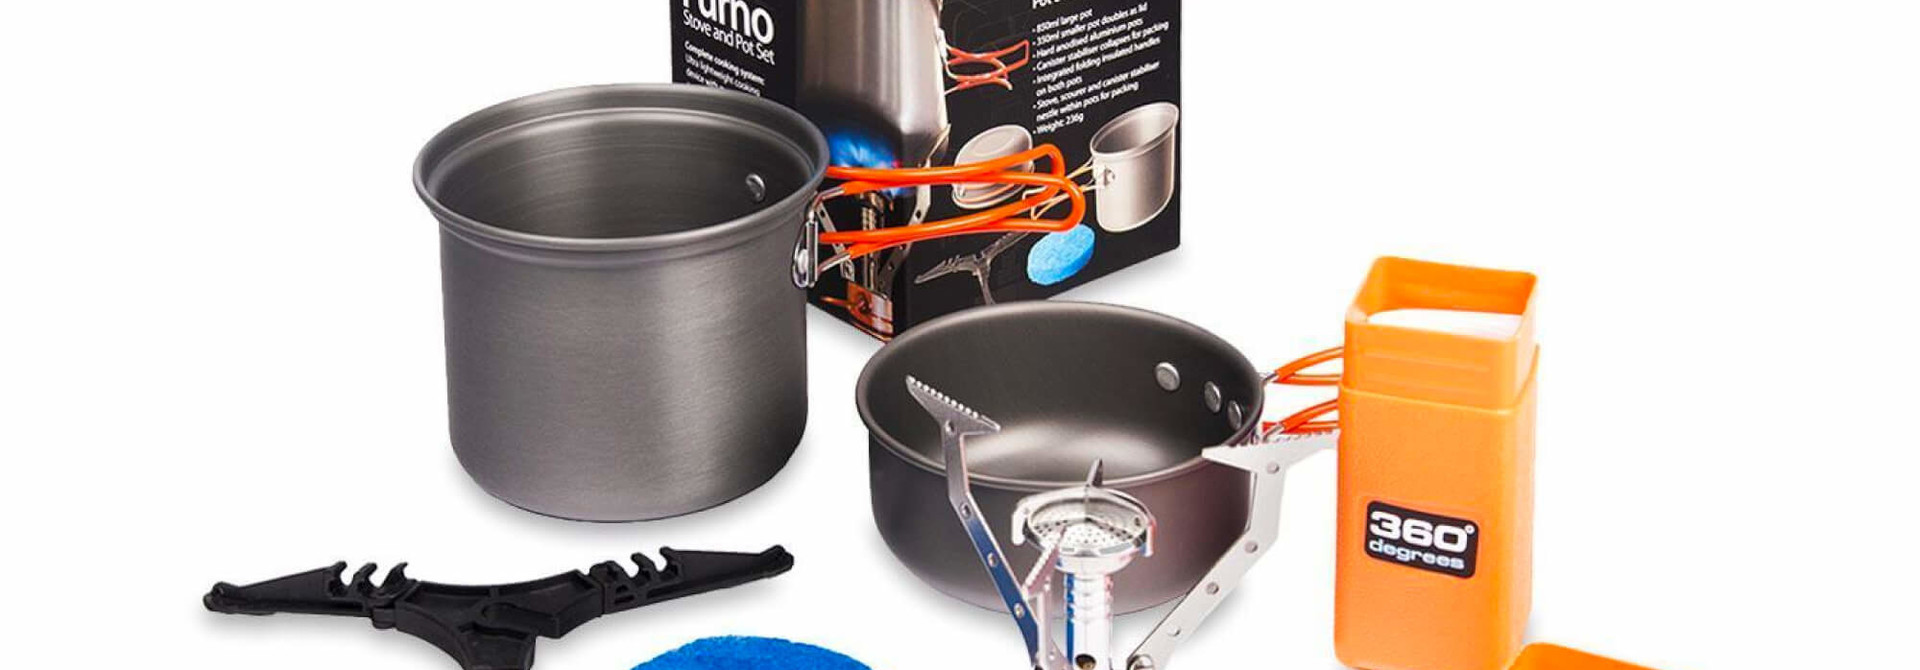 Furno Stove & Pot Set